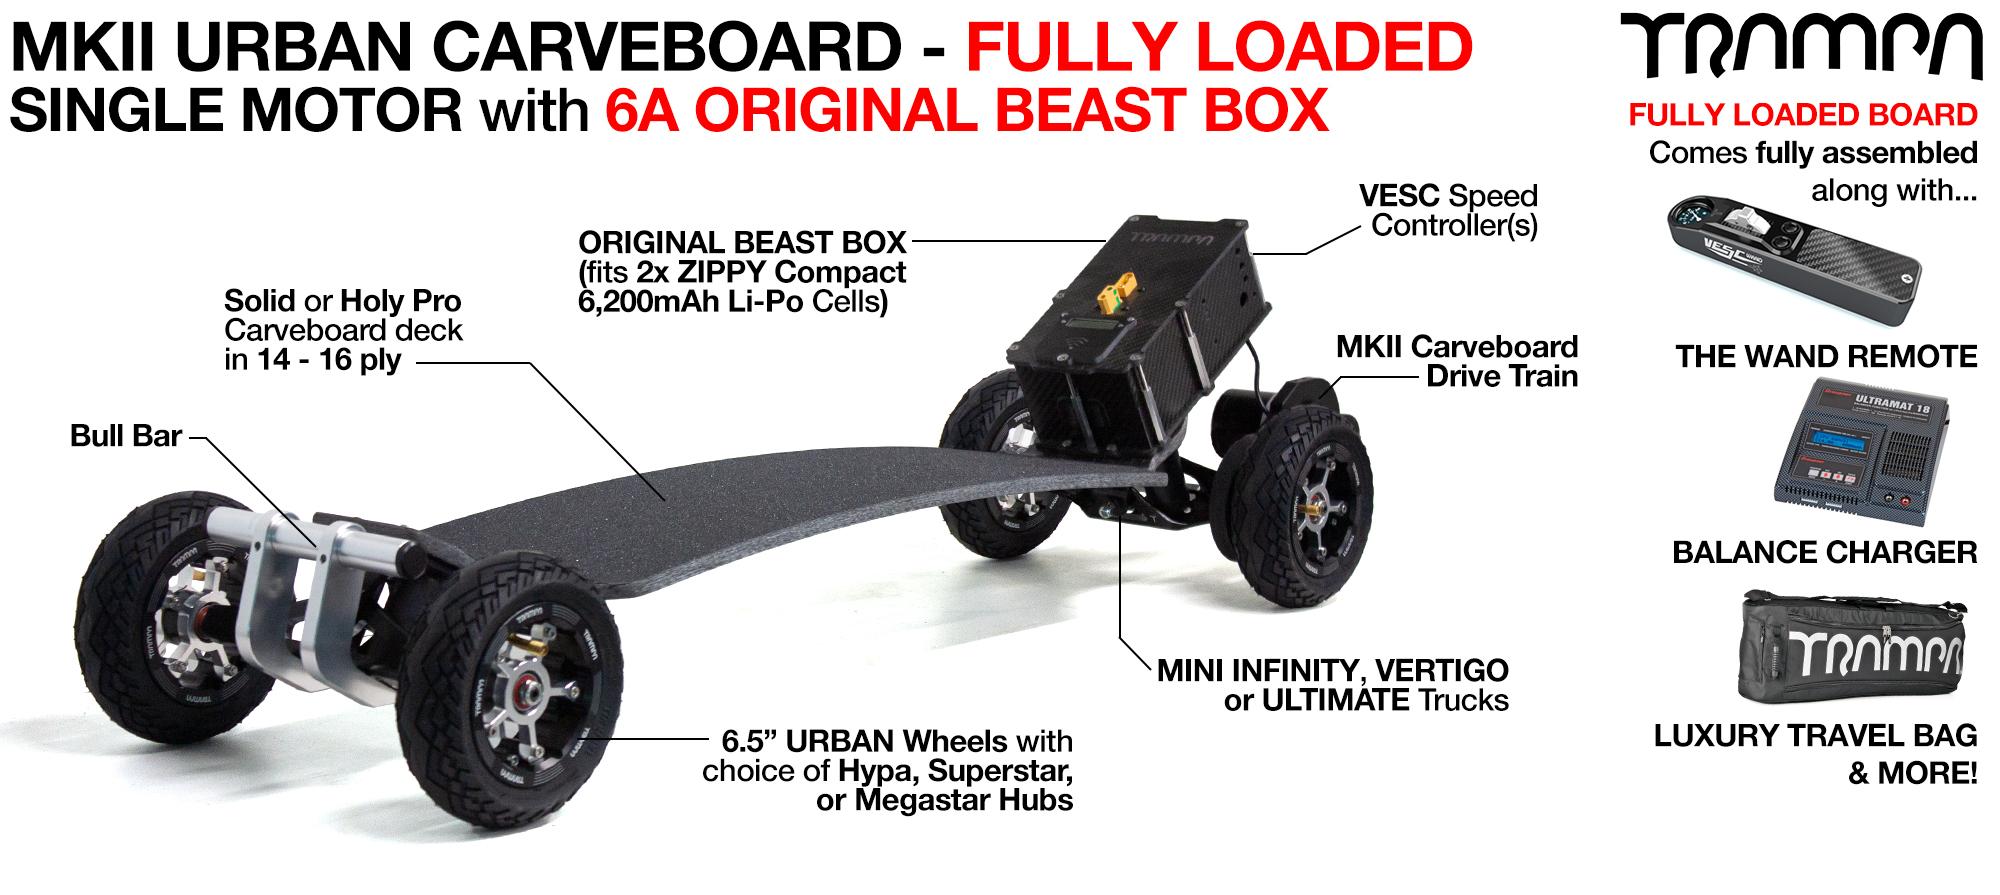 MkII TWIN 160Kv Motor TRAMPA Electric URBAN Carveboard with 12A BEAST Box, VESC HD-60T - Custom Build